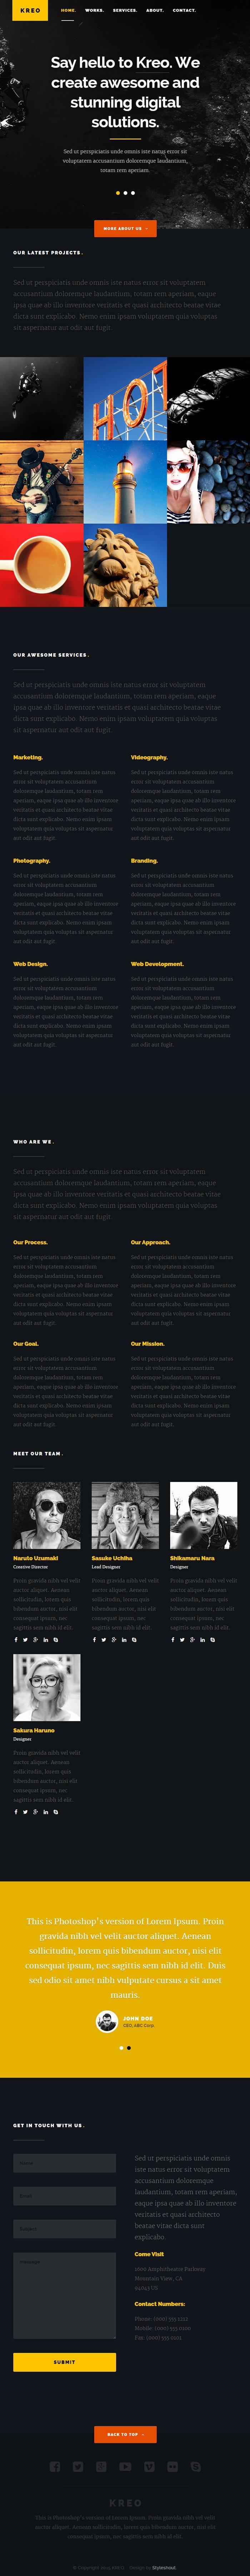 Kreo шаблон сайта (HTML5/CSS3) скачать бесплатно